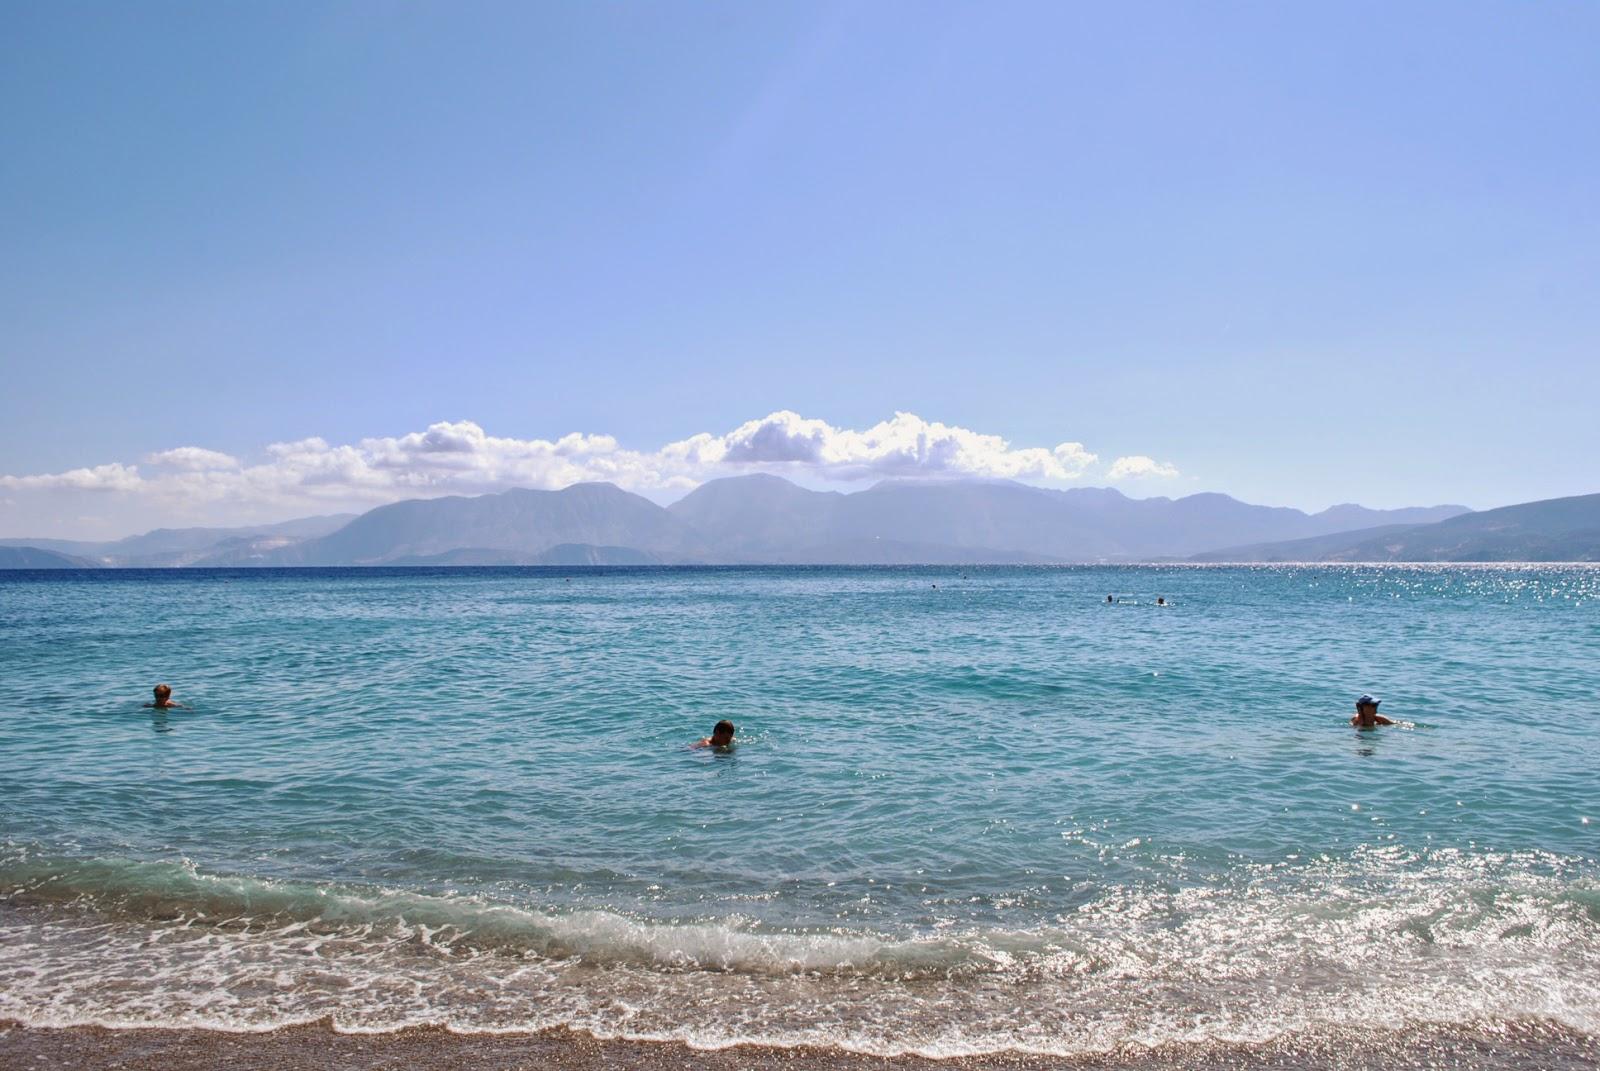 Пляж  Китроплатия, Агиос Николаос, Крит, Греция. Kitroplatia beach, Agios Nikolaos, Crete, Greece